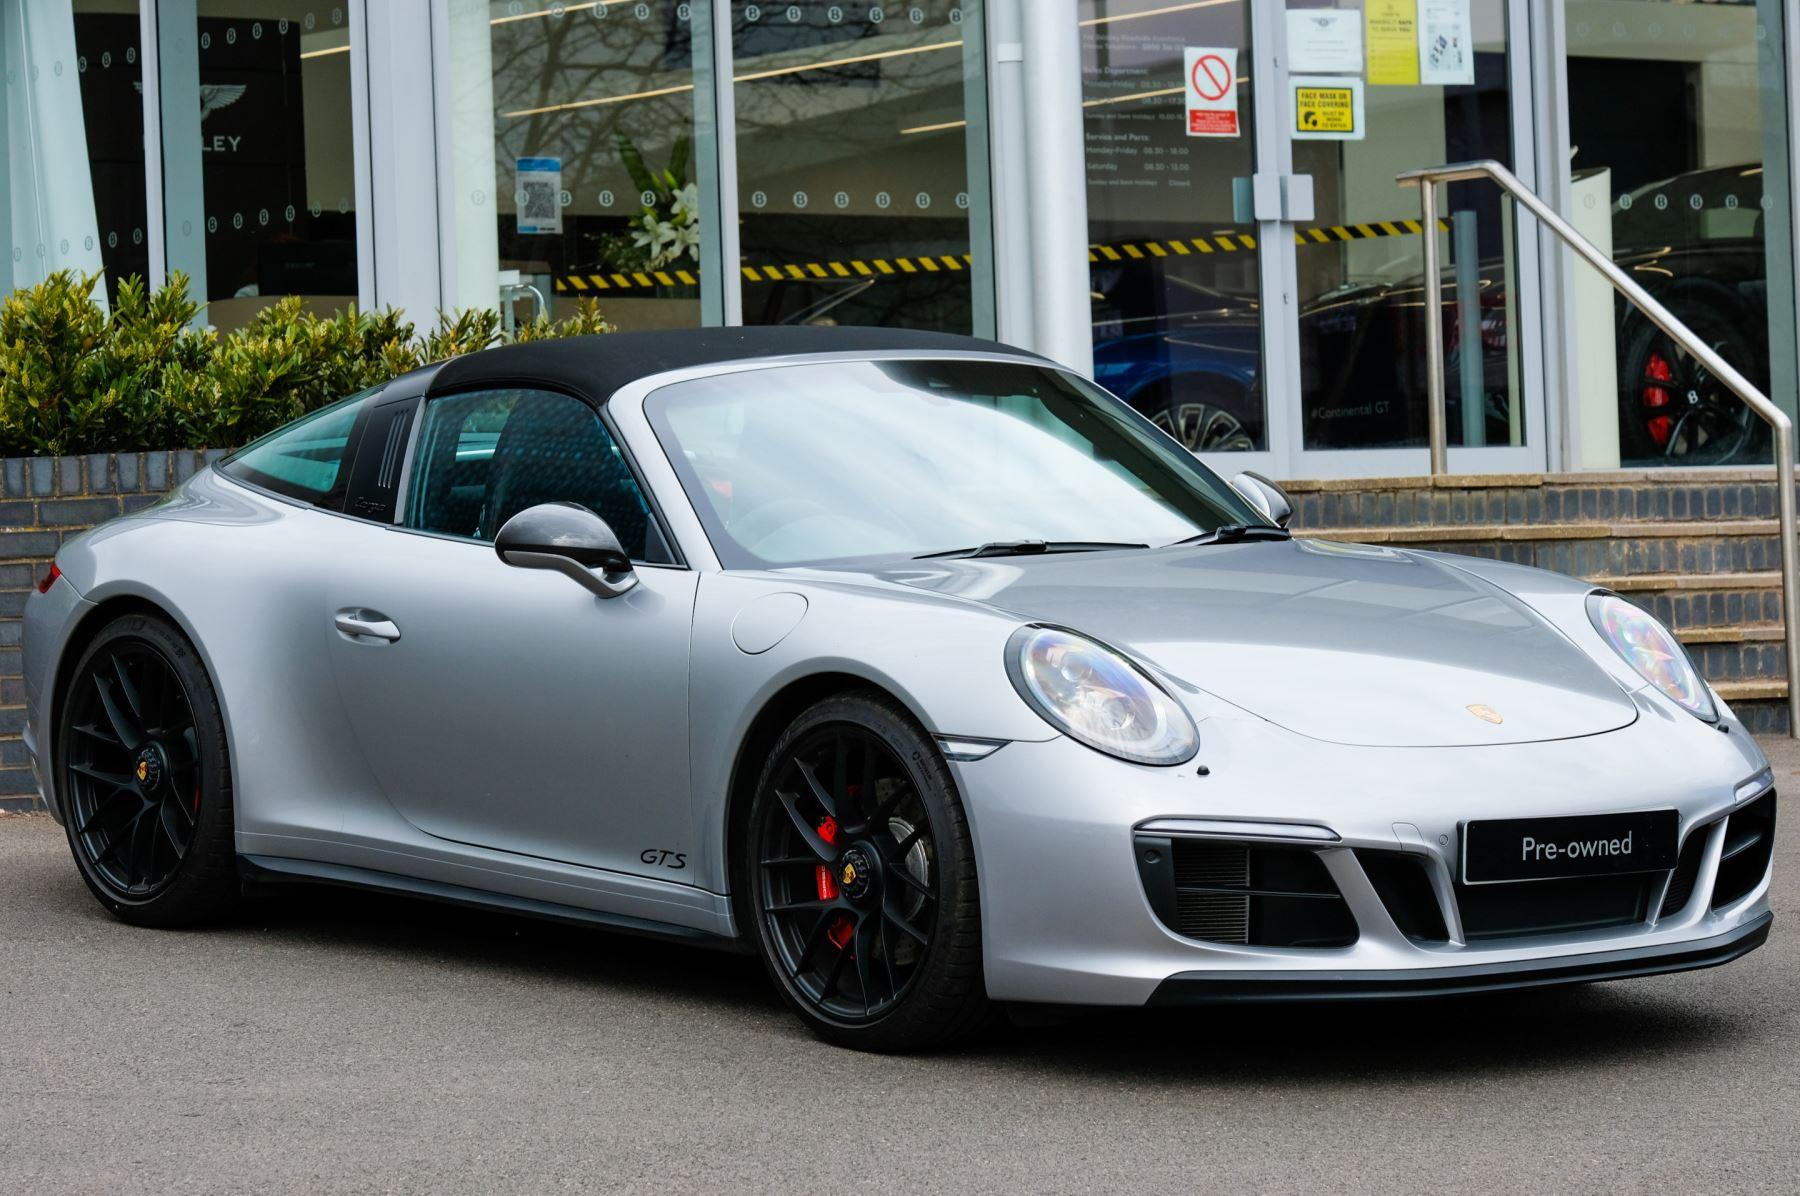 Porsche 911 TARGA 4 GTS - PDK - SPORT DESIGN PACKAGE - GTS INTERIOR PACKAGE image 36